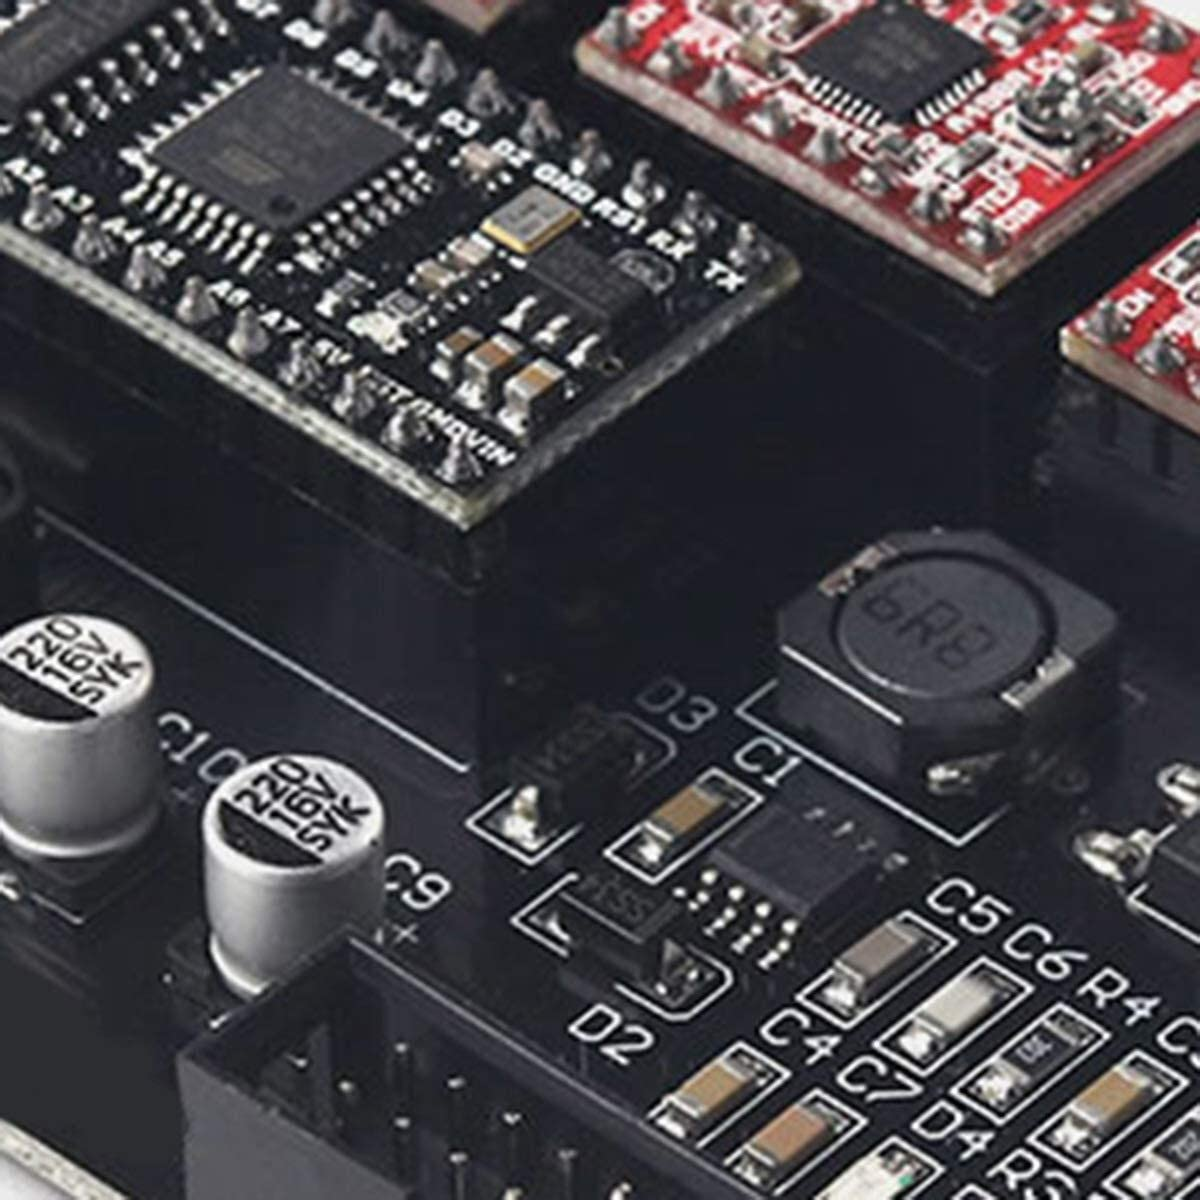 DJY-JY Eleksmana V5.2 GRBL CNC Motherboard USB CNC 3-Achsen-Steuerkarte CNC DIY-Teile Ger/ät USB Schrittmotortreiber Motortreiber